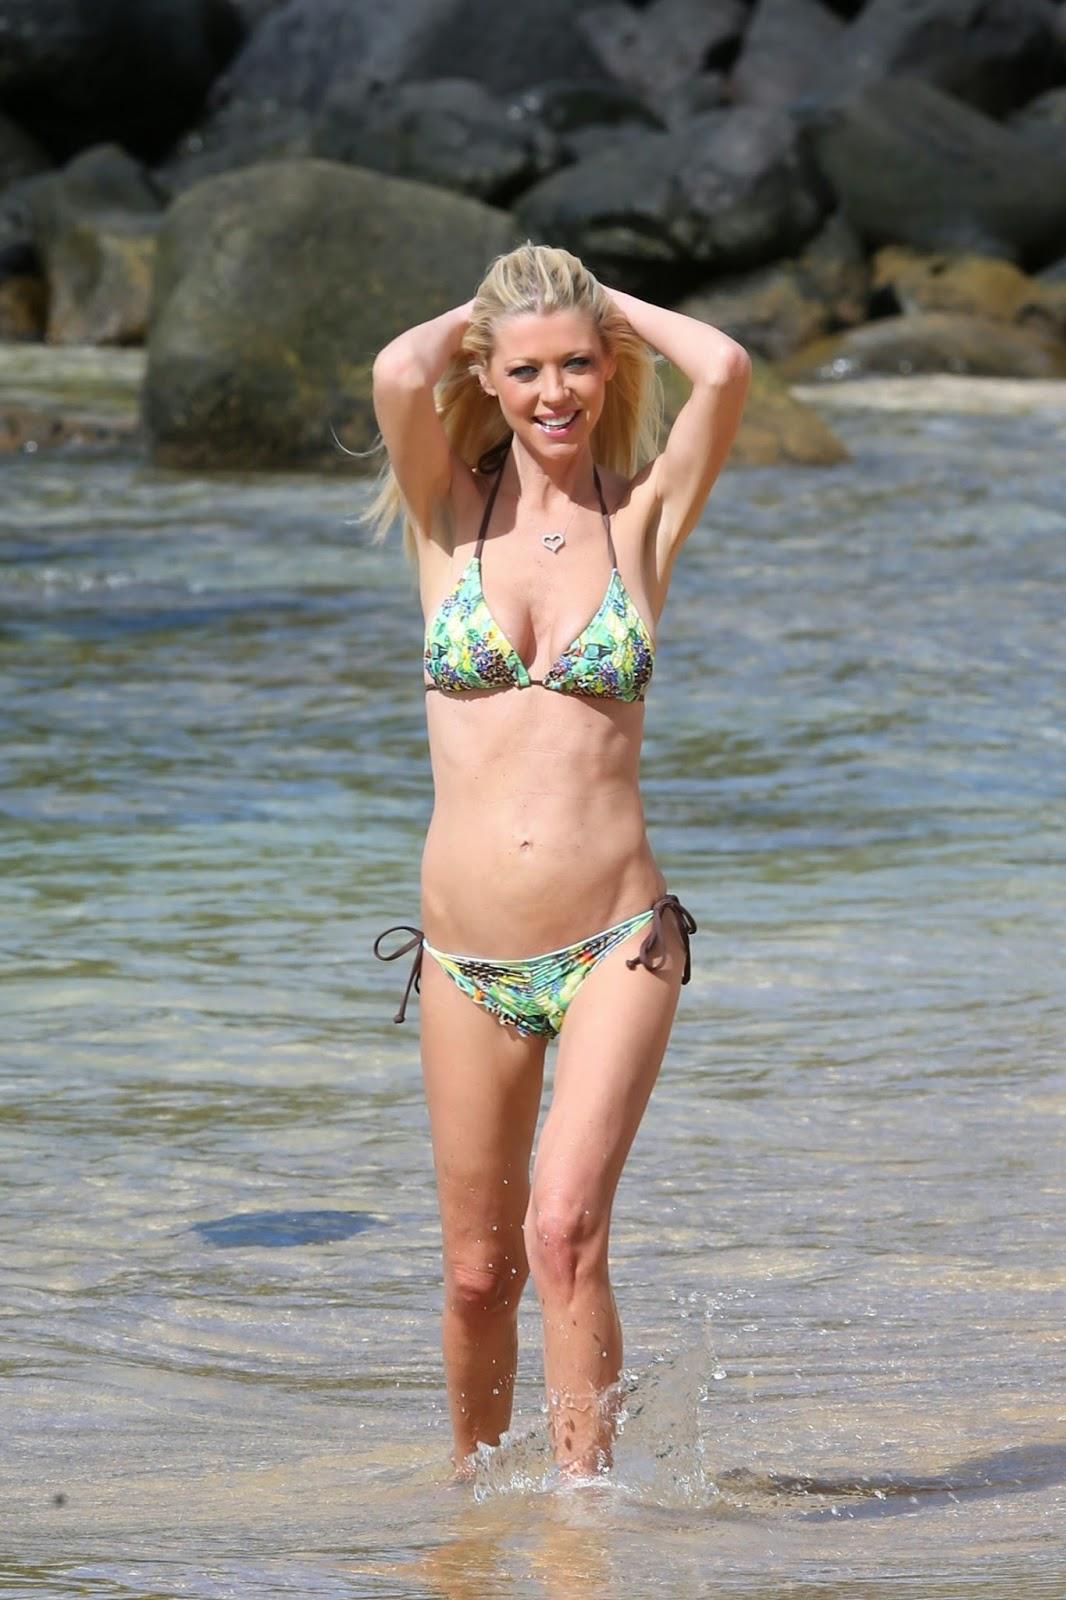 Tara Reid flaunts bikini looks at beach in Hawaii